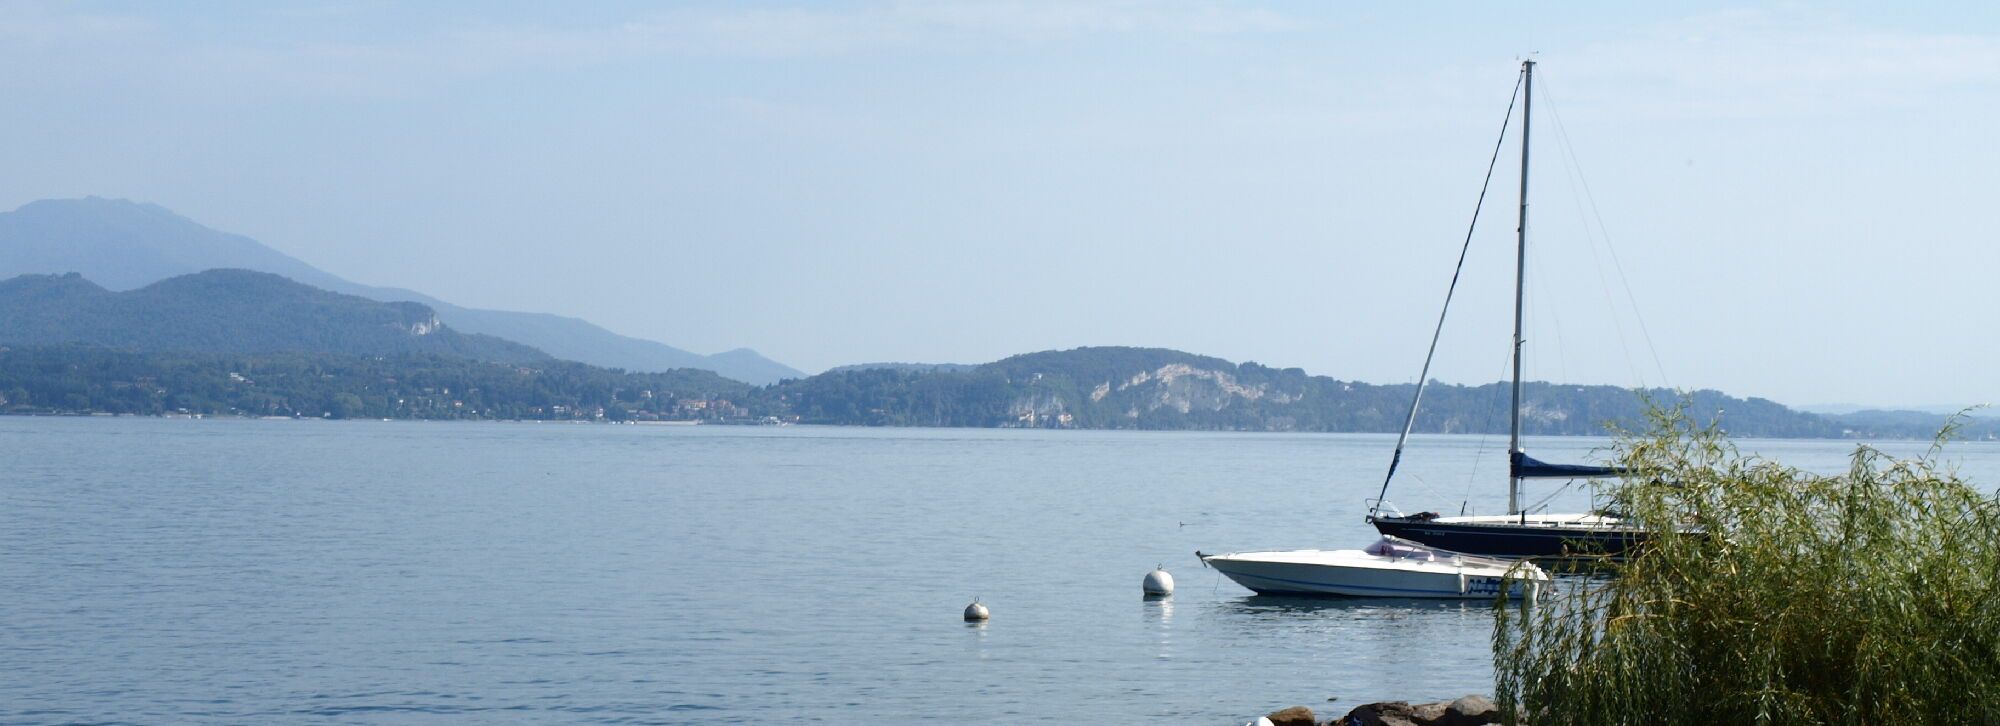 Segelboot am Lago Maggiore